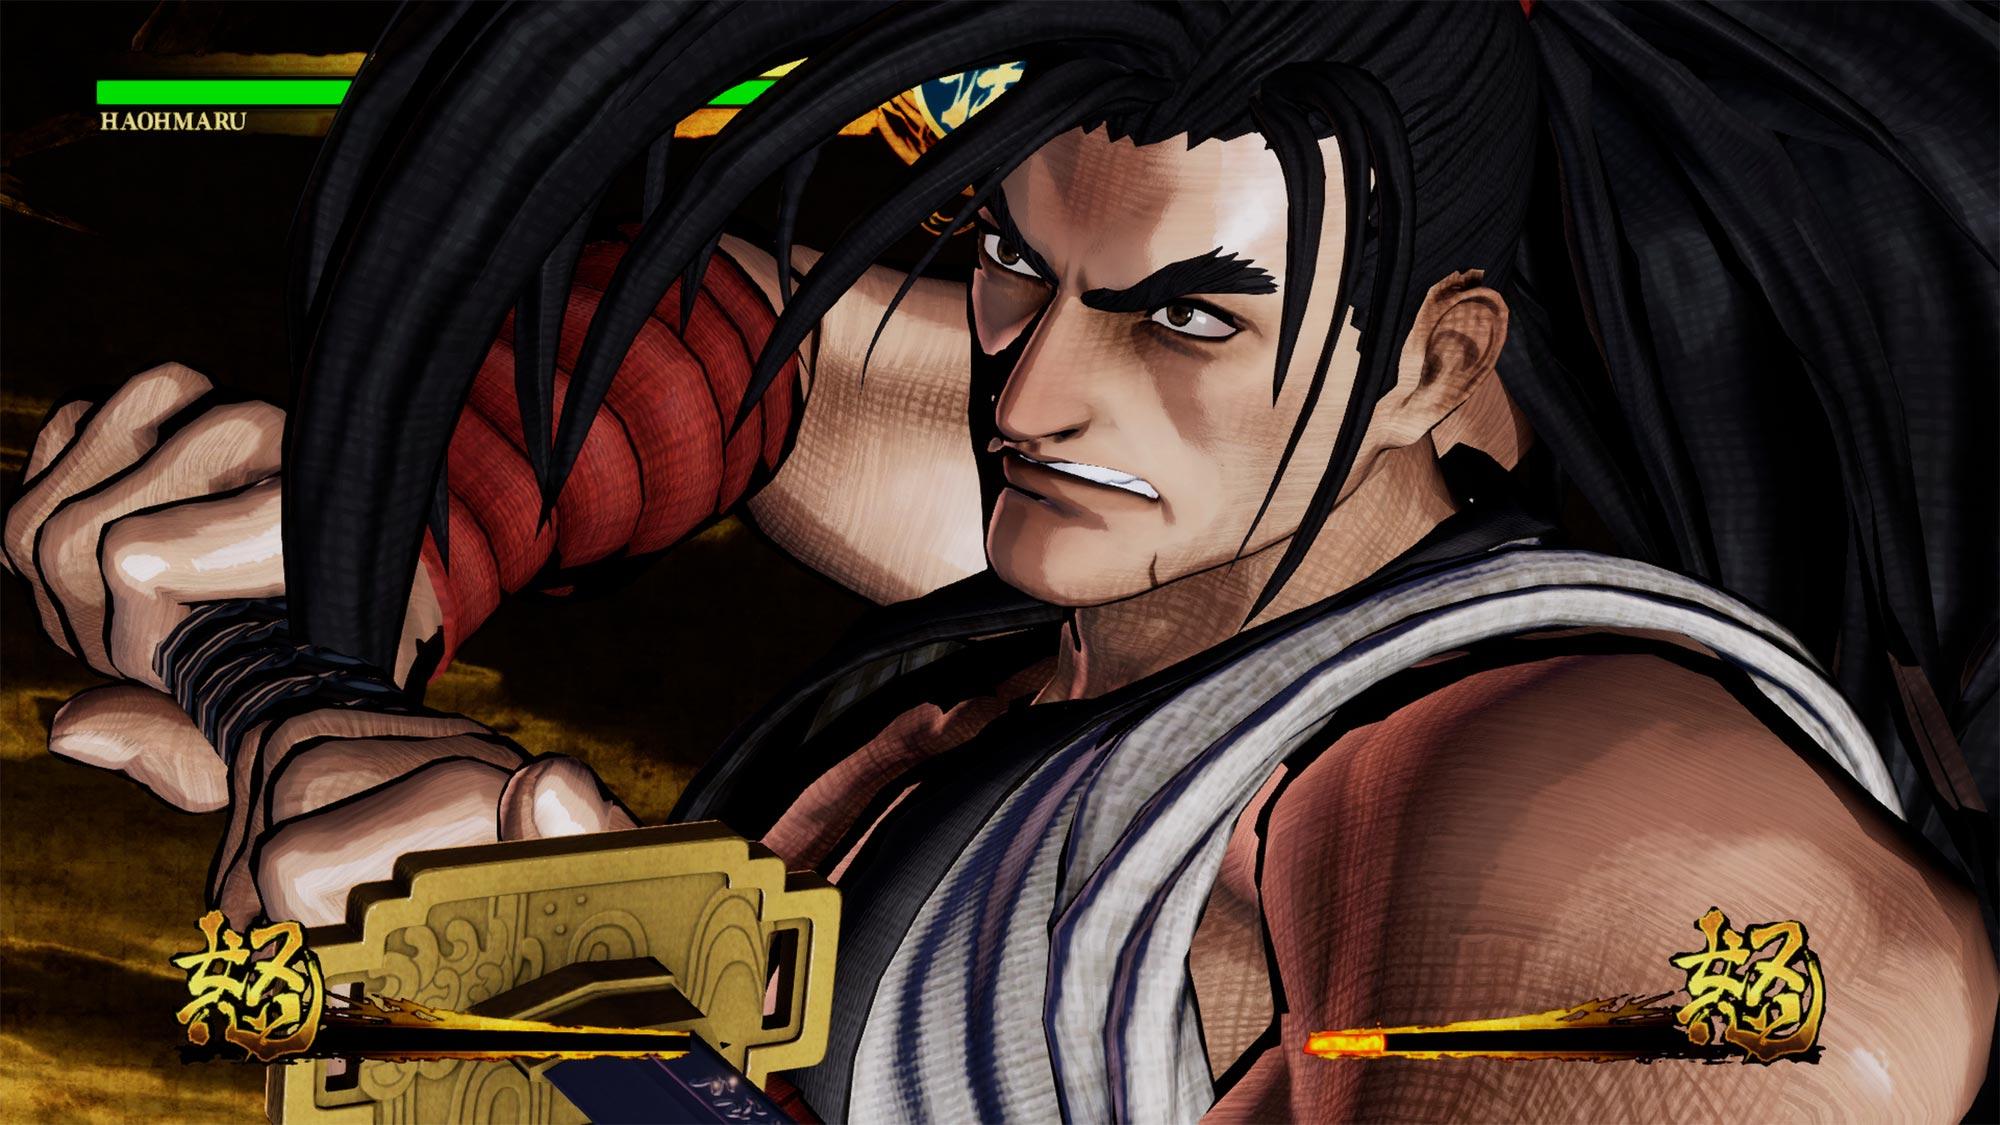 Samurai Shodown screenshots 4 out of 11 image gallery